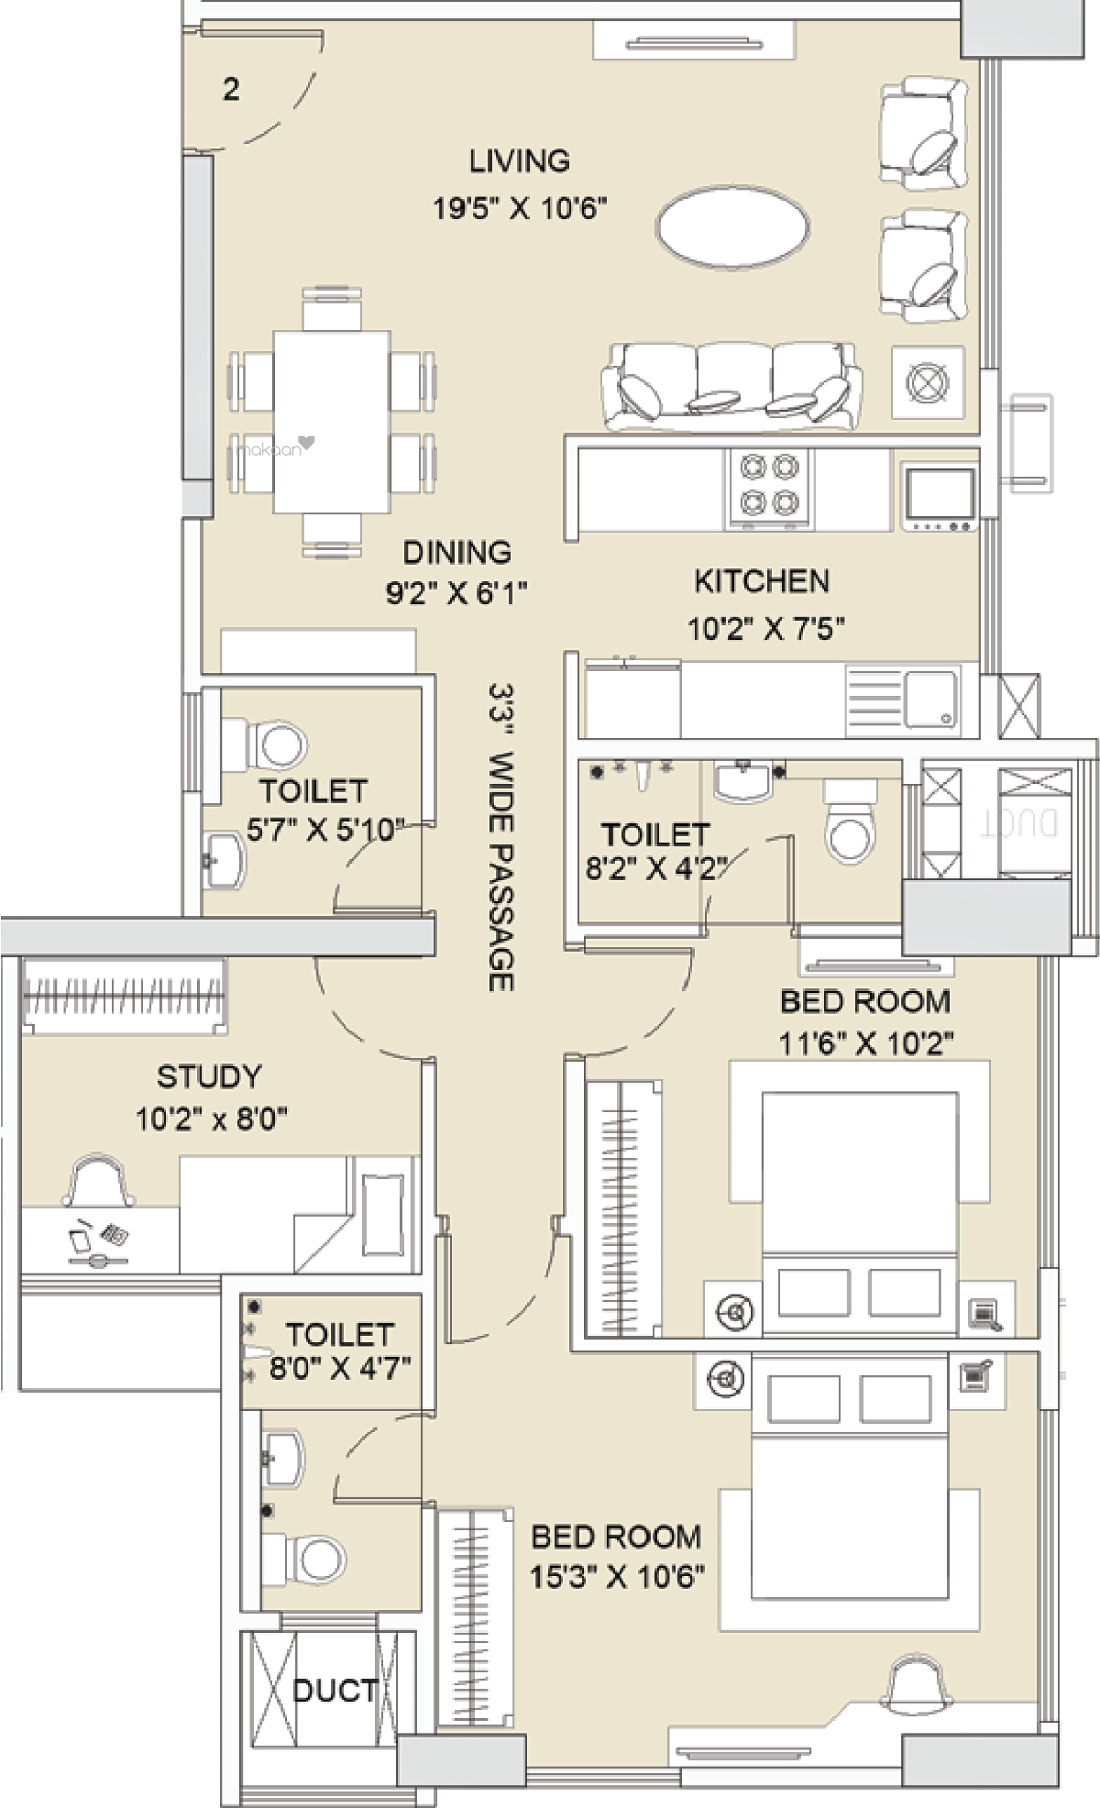 4050 sq ft 4BHK 4BHK+4T (4,050 sq ft) Property By Proptiger In Magnificia, Mahadevapura